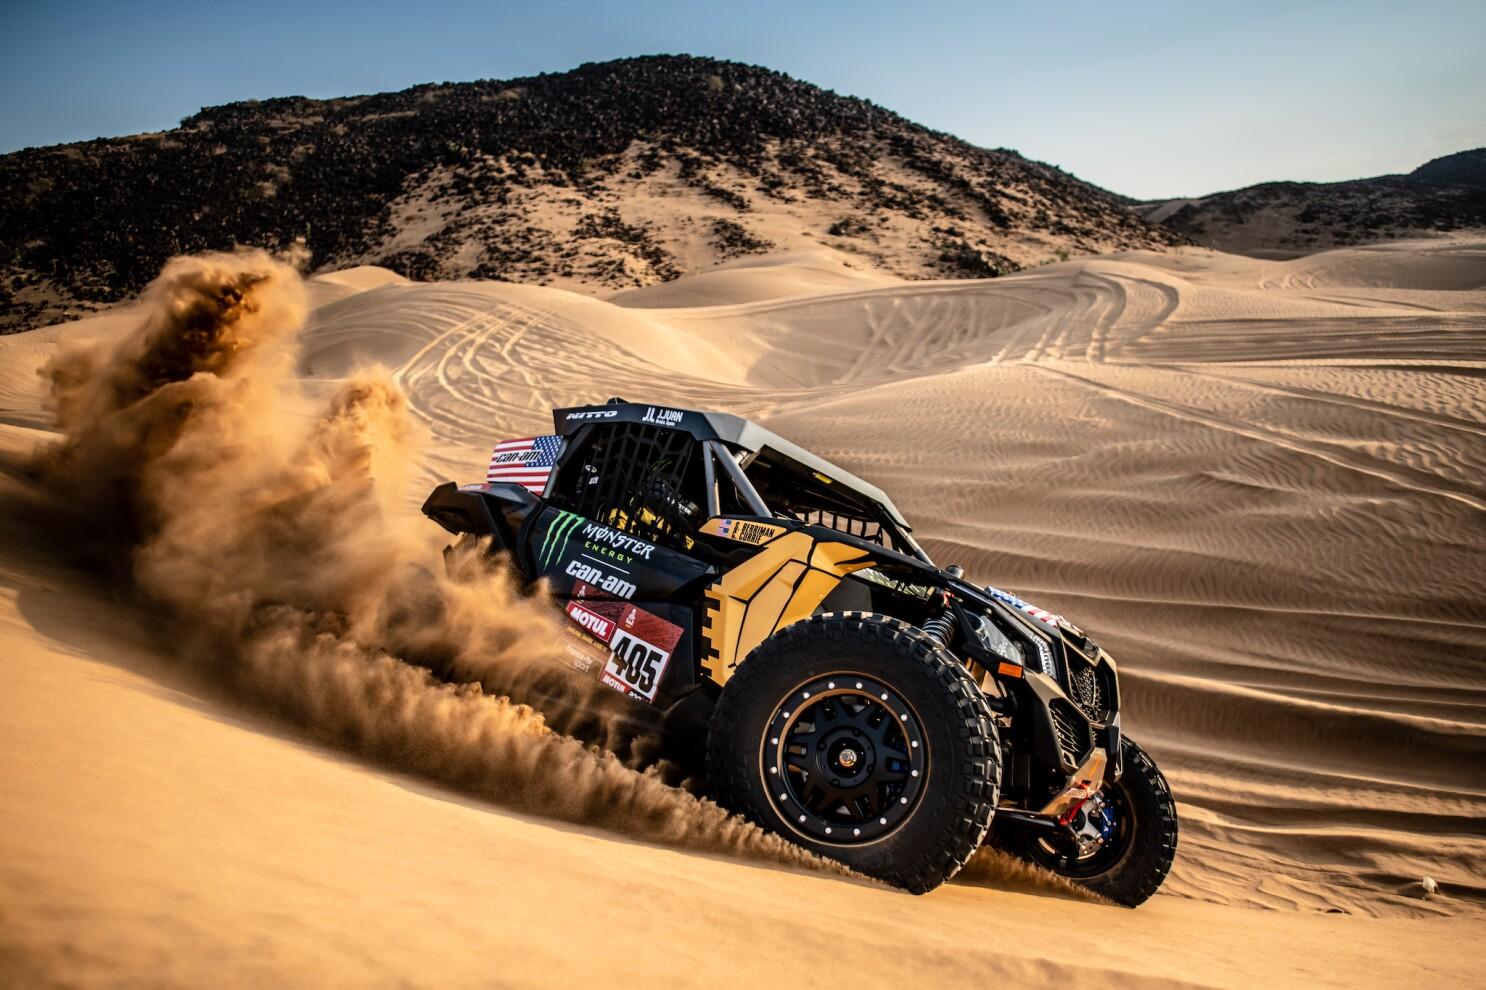 Casey Currie Hopes To Make History At Treacherous Dakar Rally Los Angeles Times